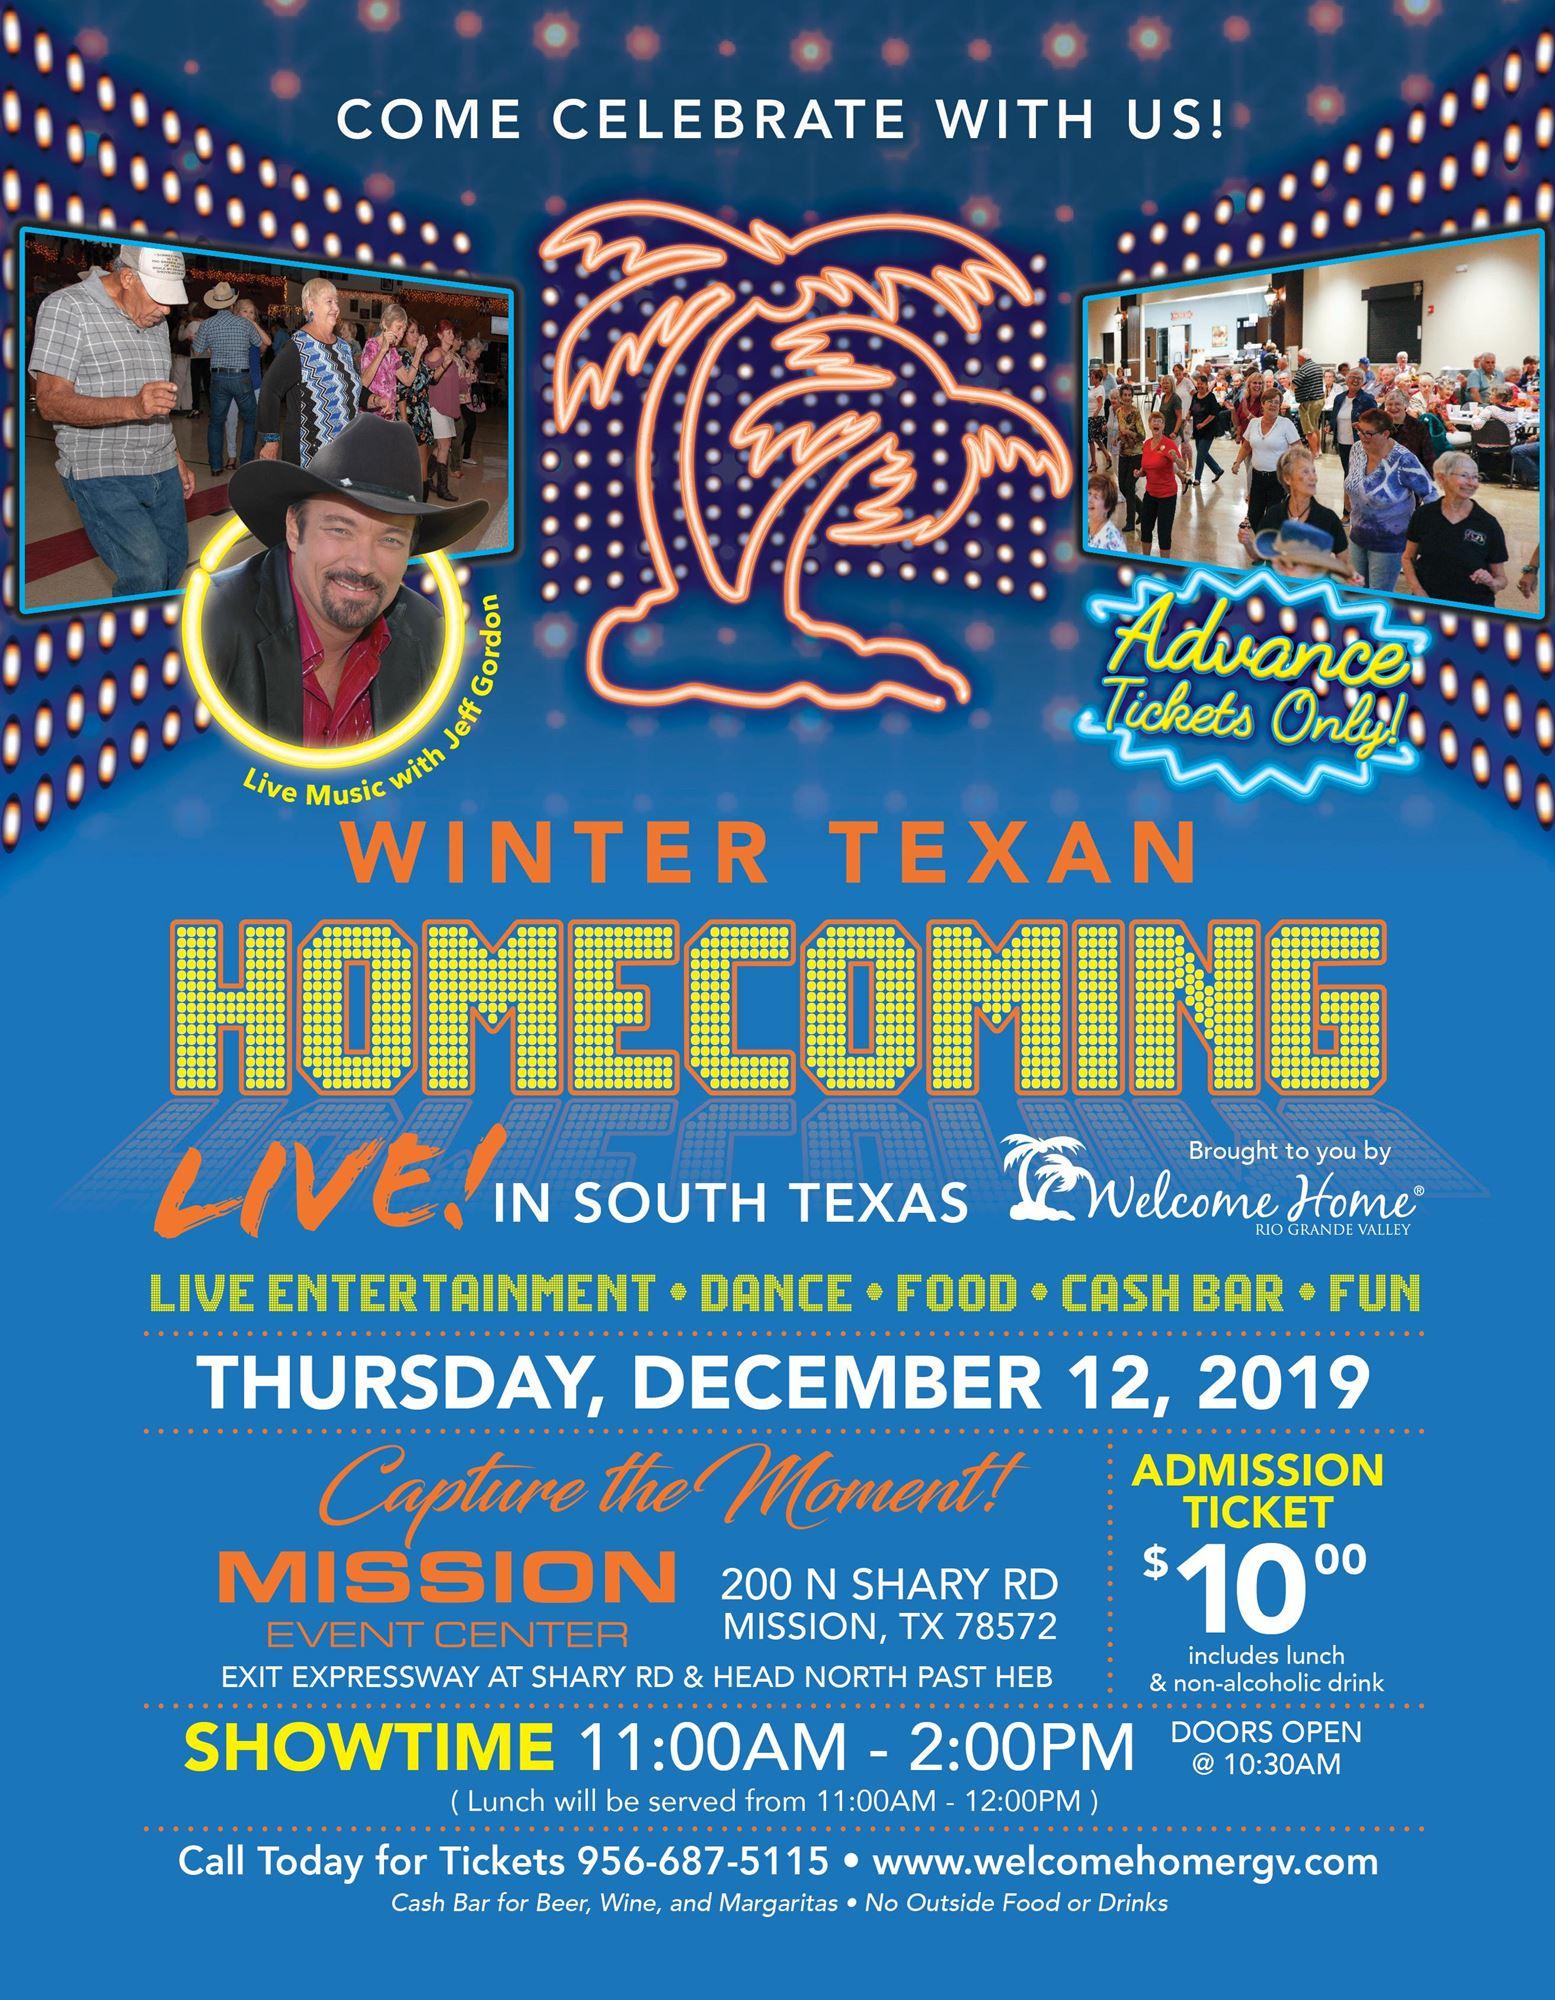 Winter Texan Homecoming